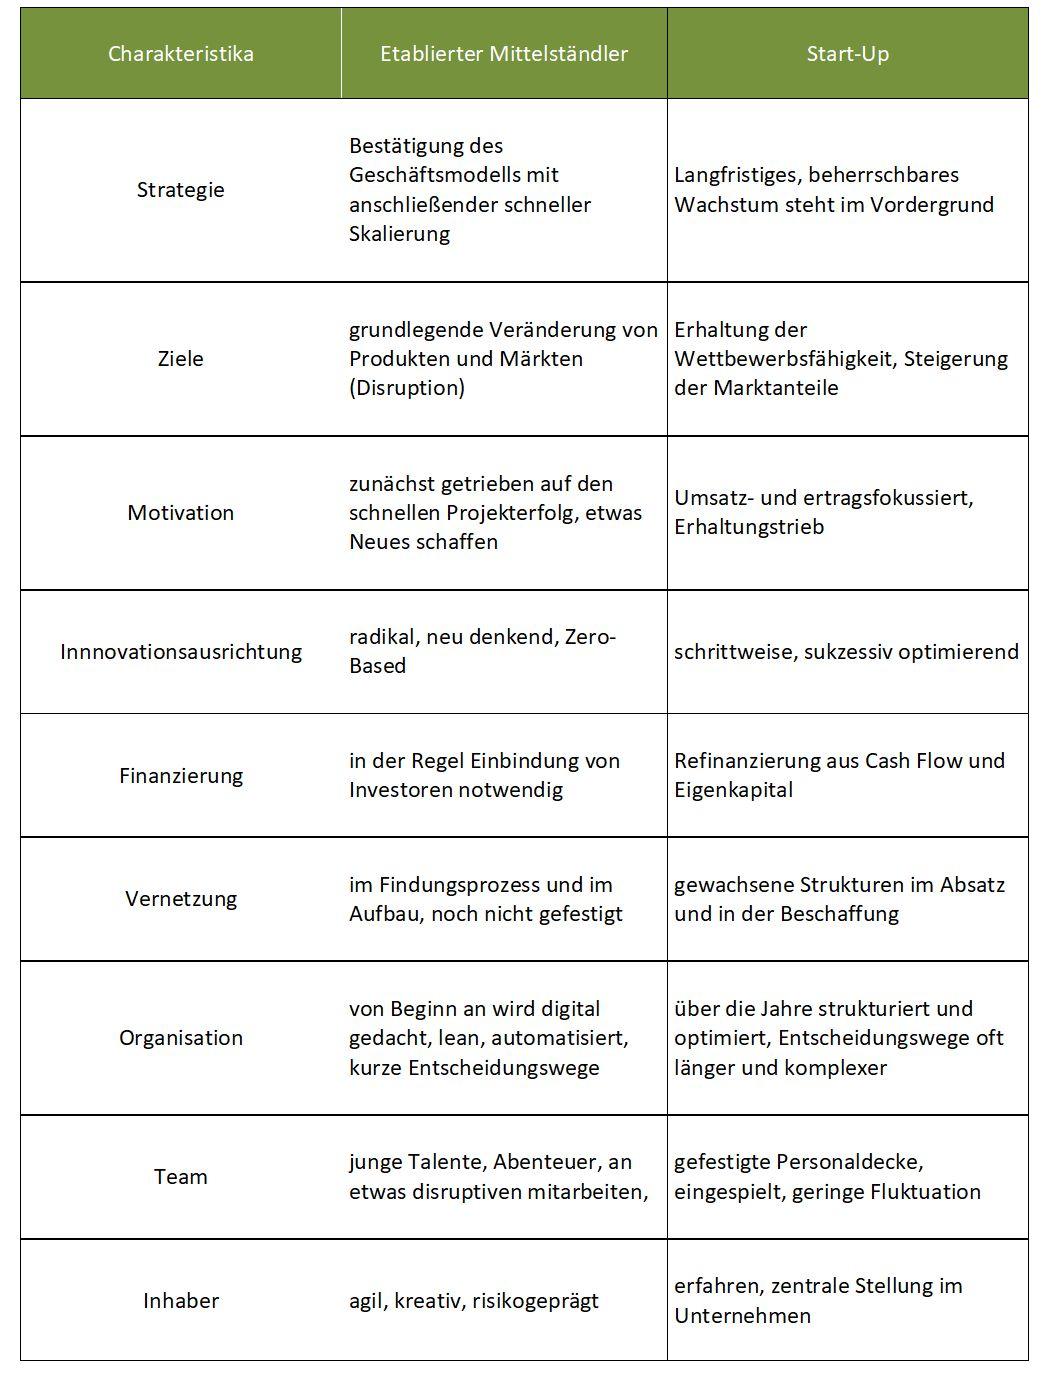 Charakteristika Mittelstand vs. Startups